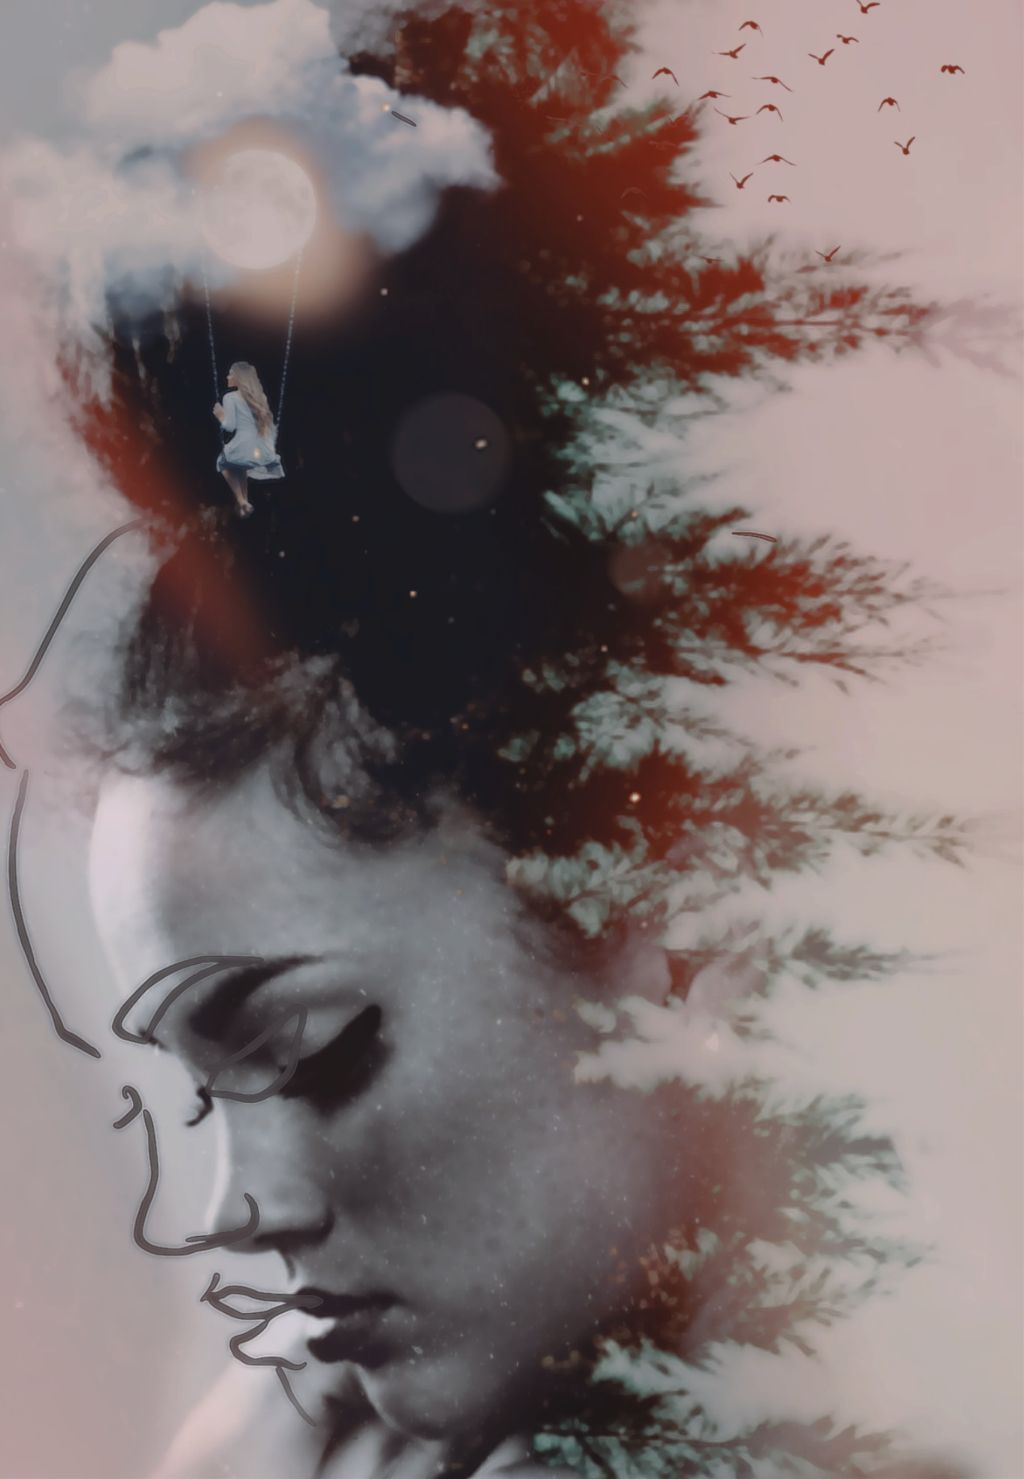 #doubleexposure #madewithpicsart #mycreations #double_exposure #myedit #manipulation #creative #art #woman #forest #stickers #lights #photooftheday #beautiful #be_creative #sketchereffect #heypicsart